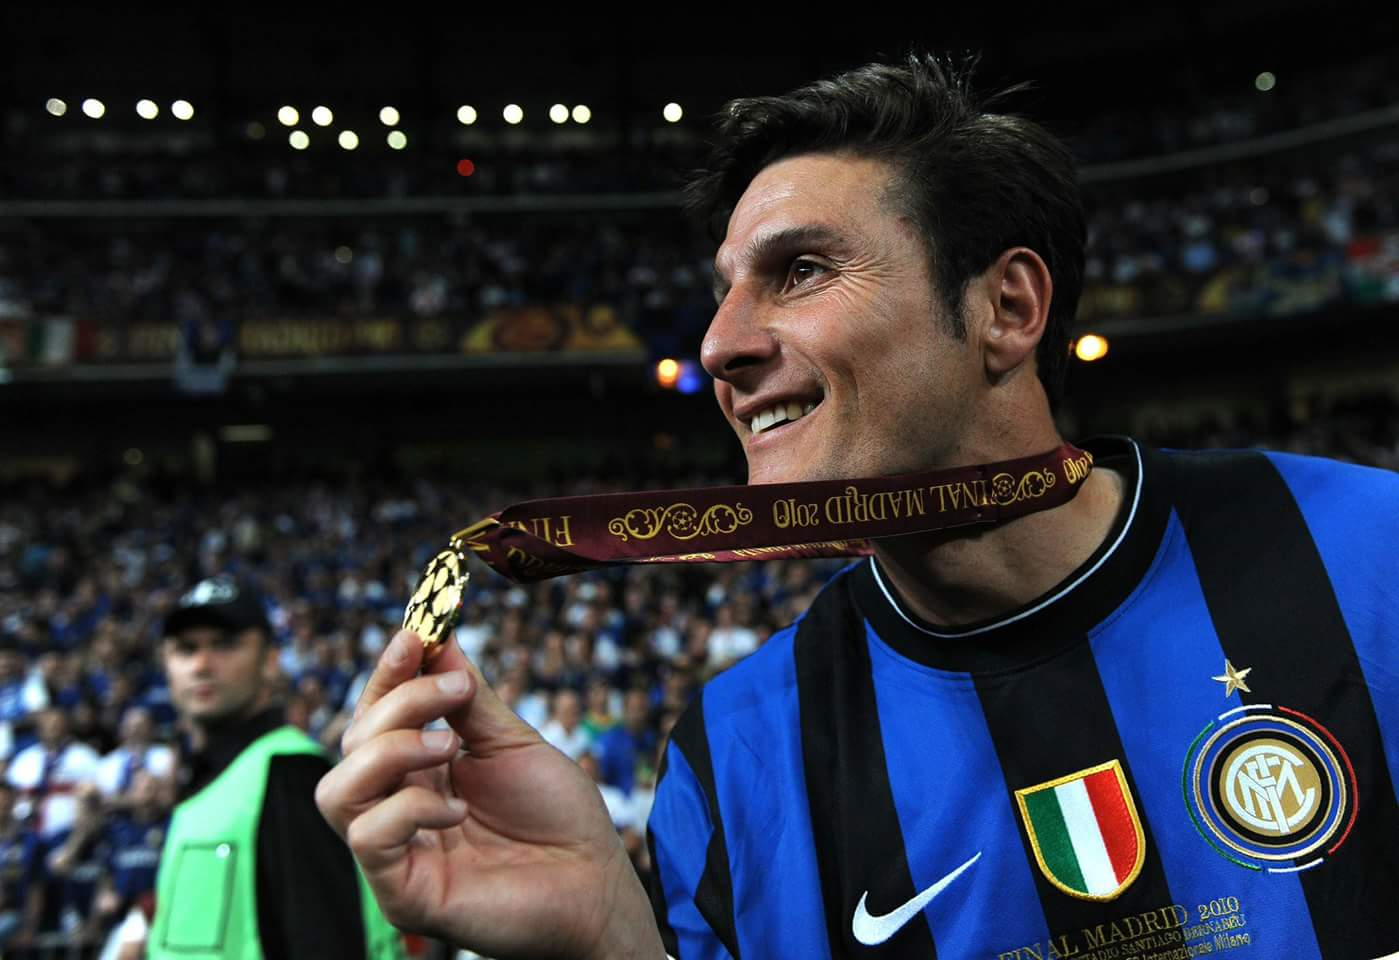 Happy birthday to Javier Zanetti!  19 seasons 858 games 21 goals  16 trophies  legend.